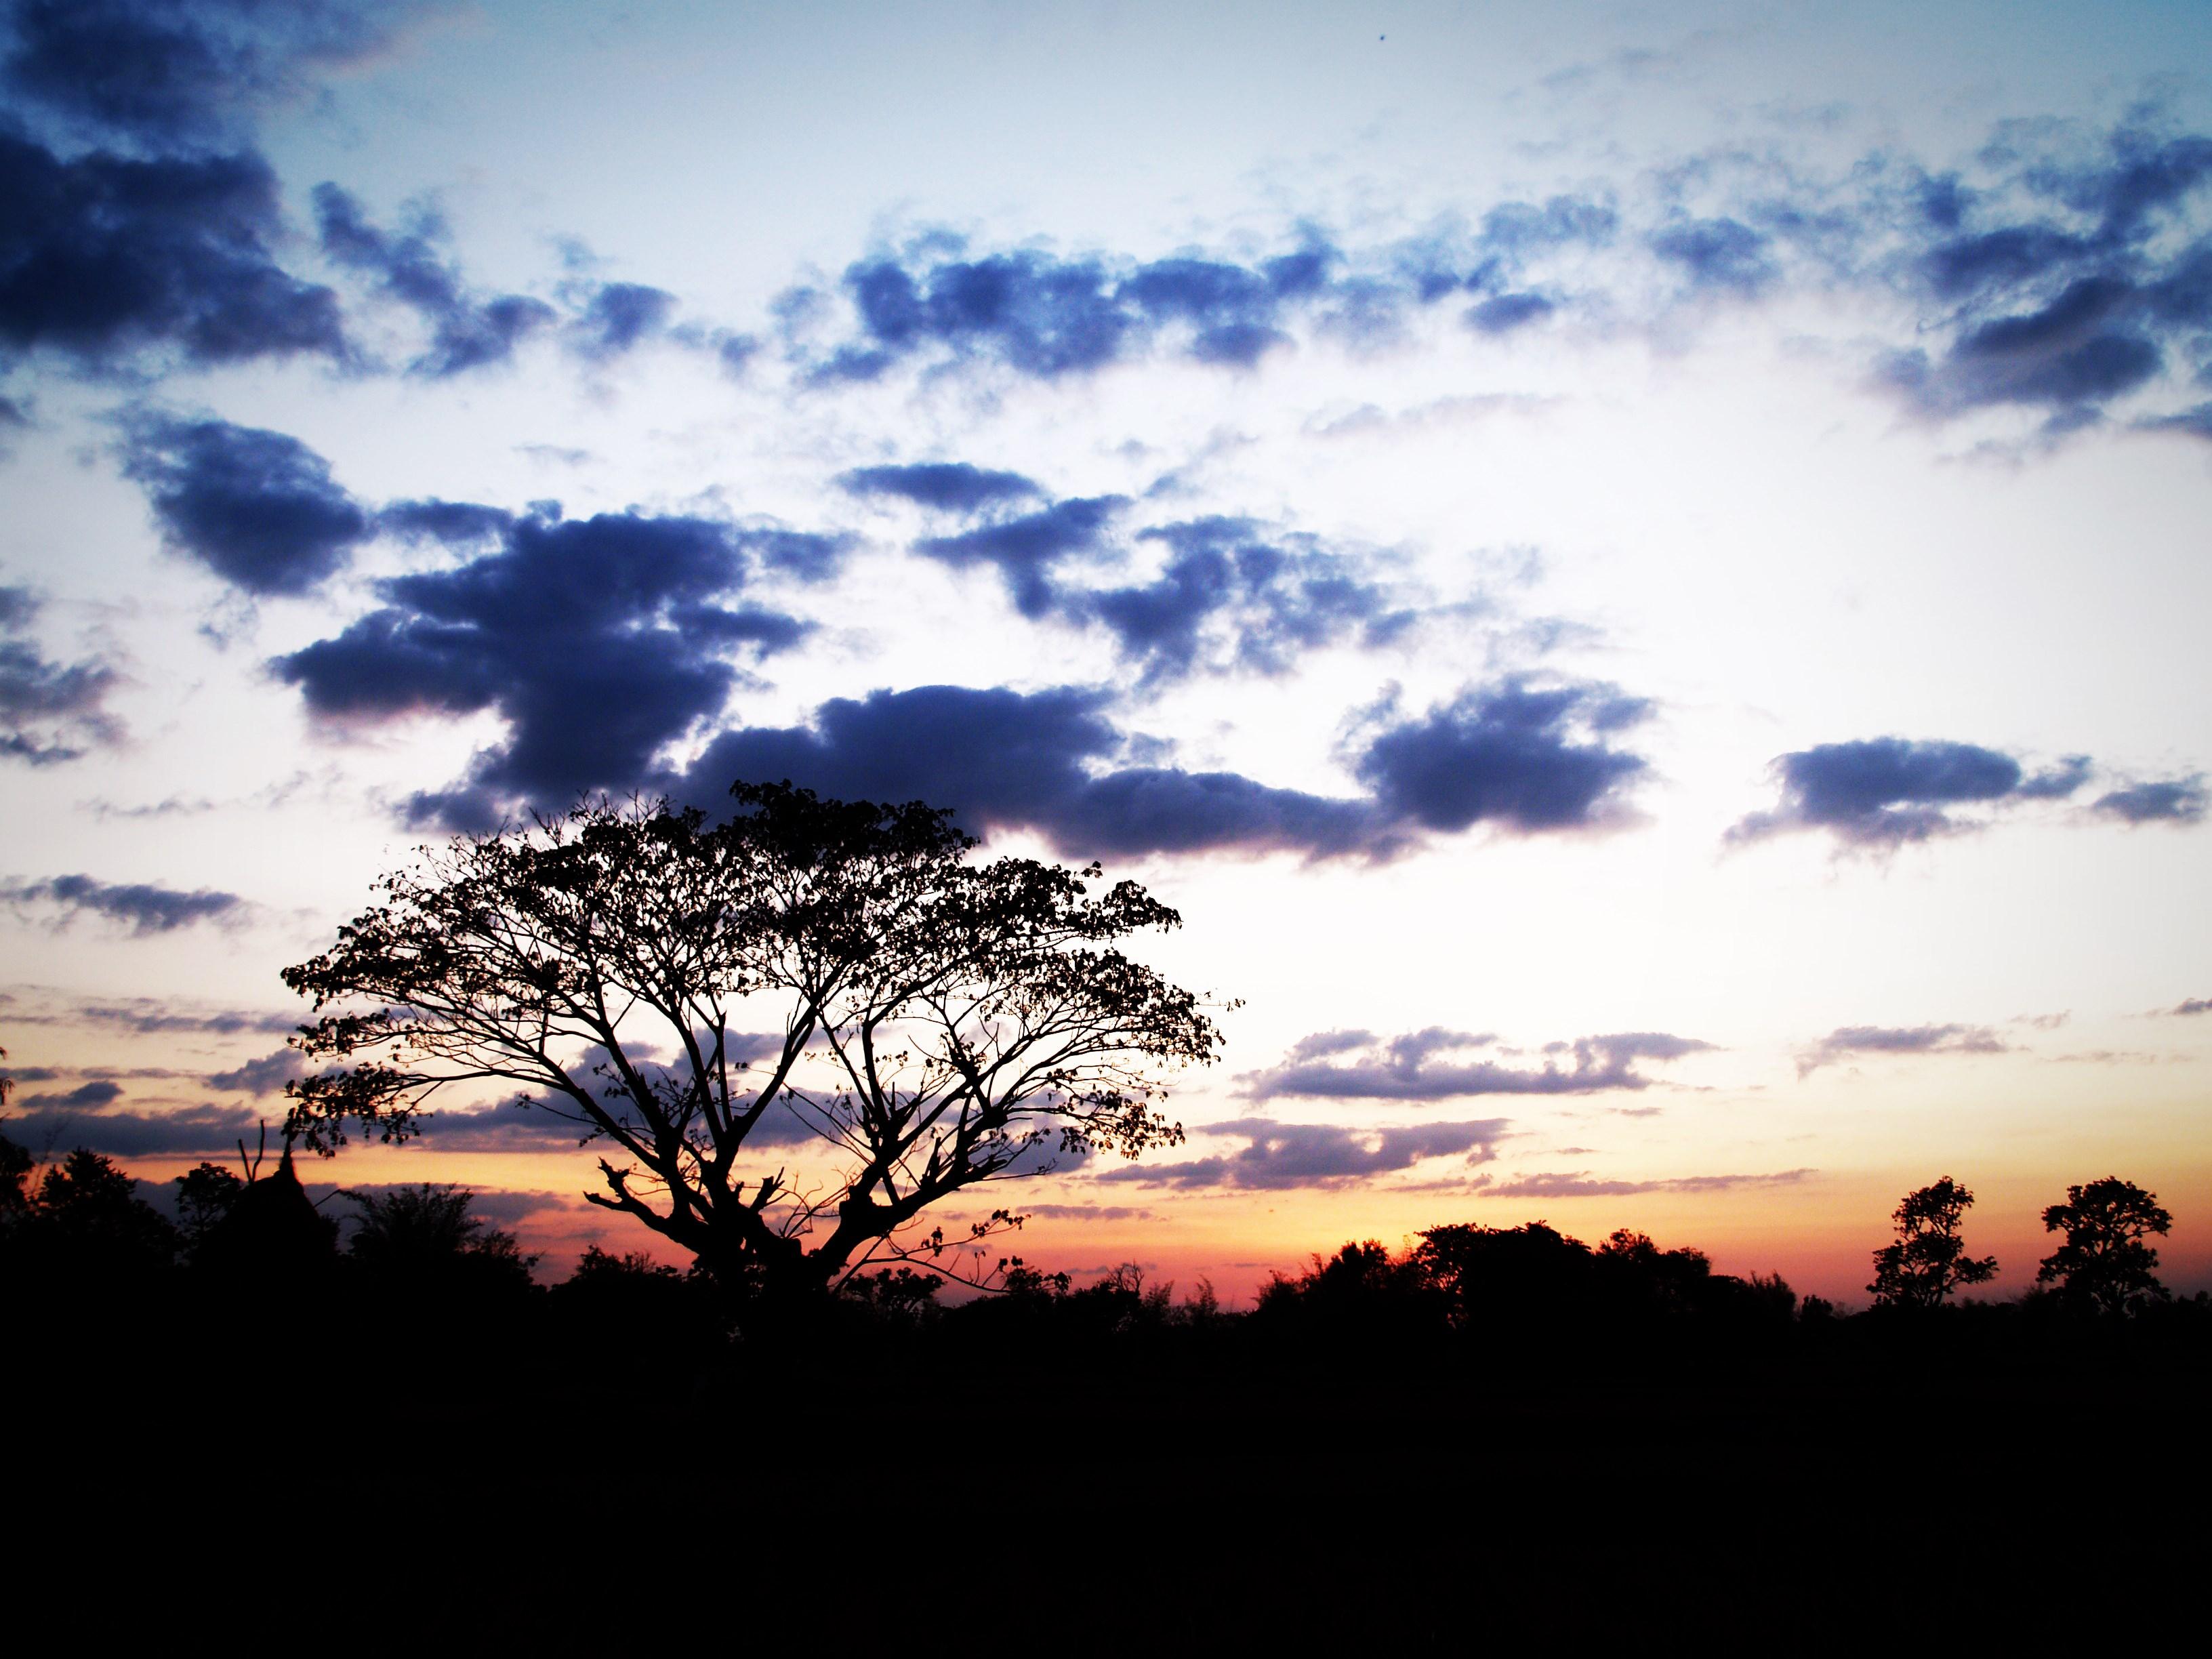 landscape sunset silhouette tree